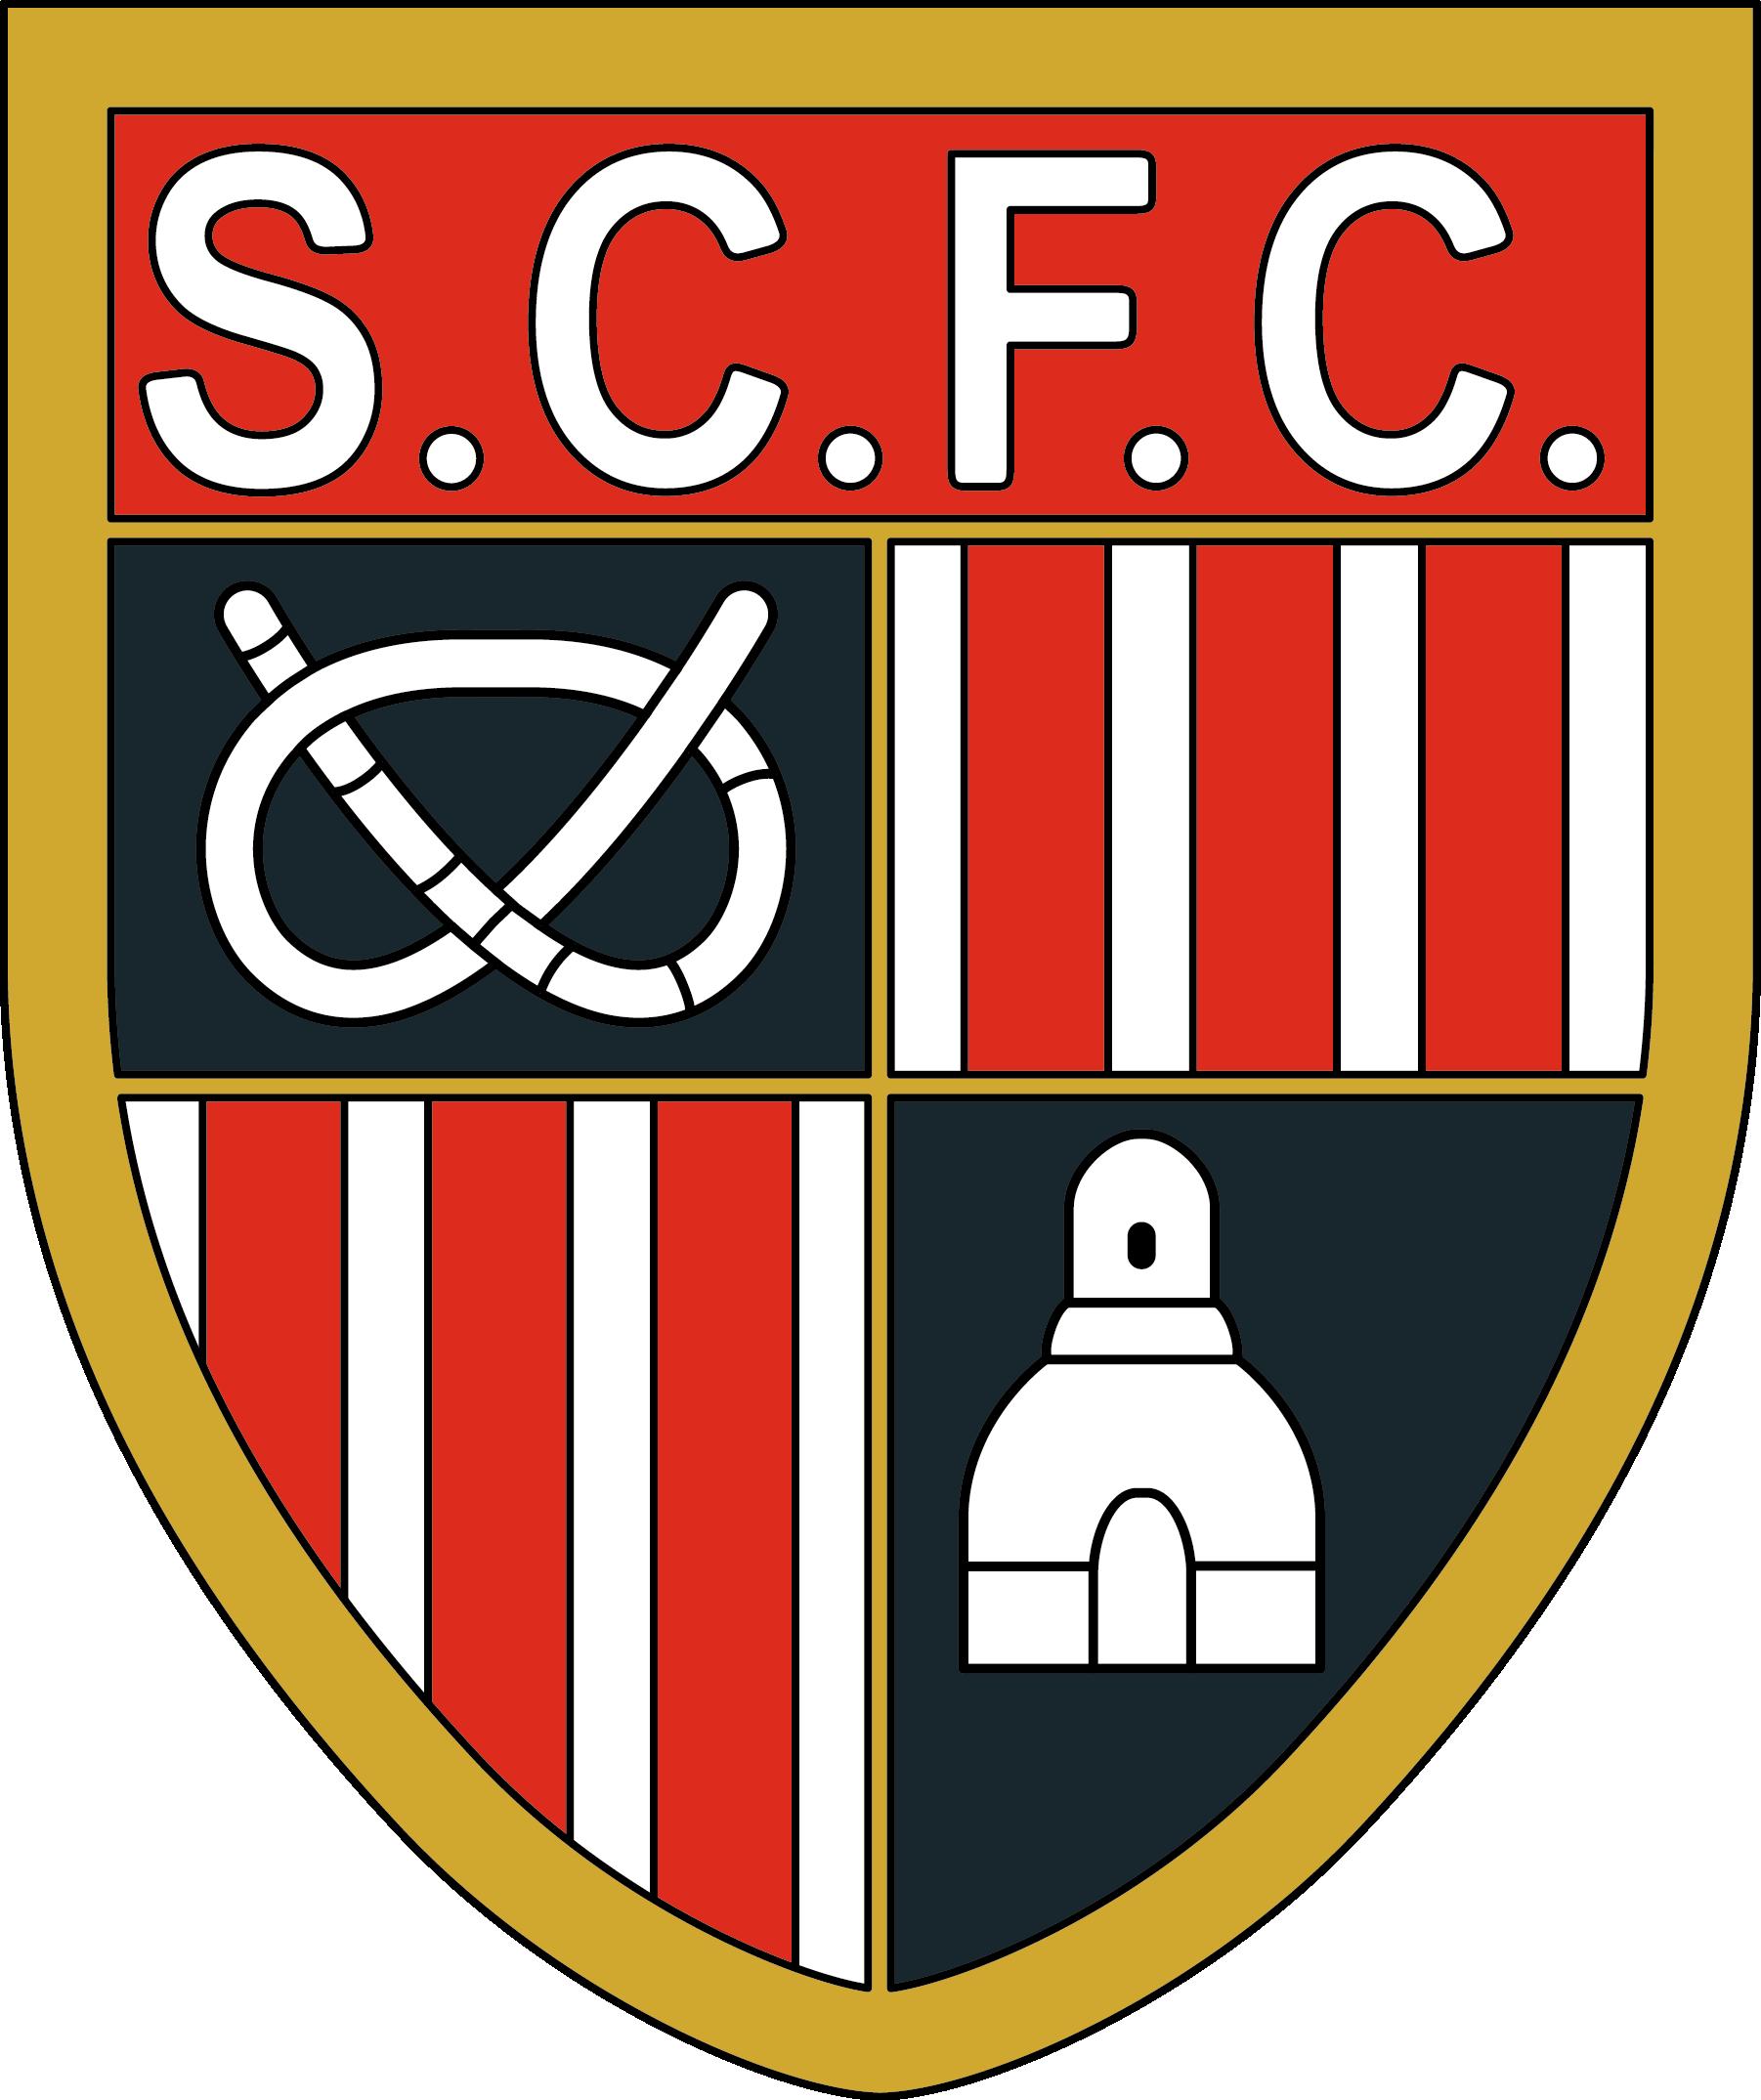 Stoke city fc emblems. Football field ruler clipart